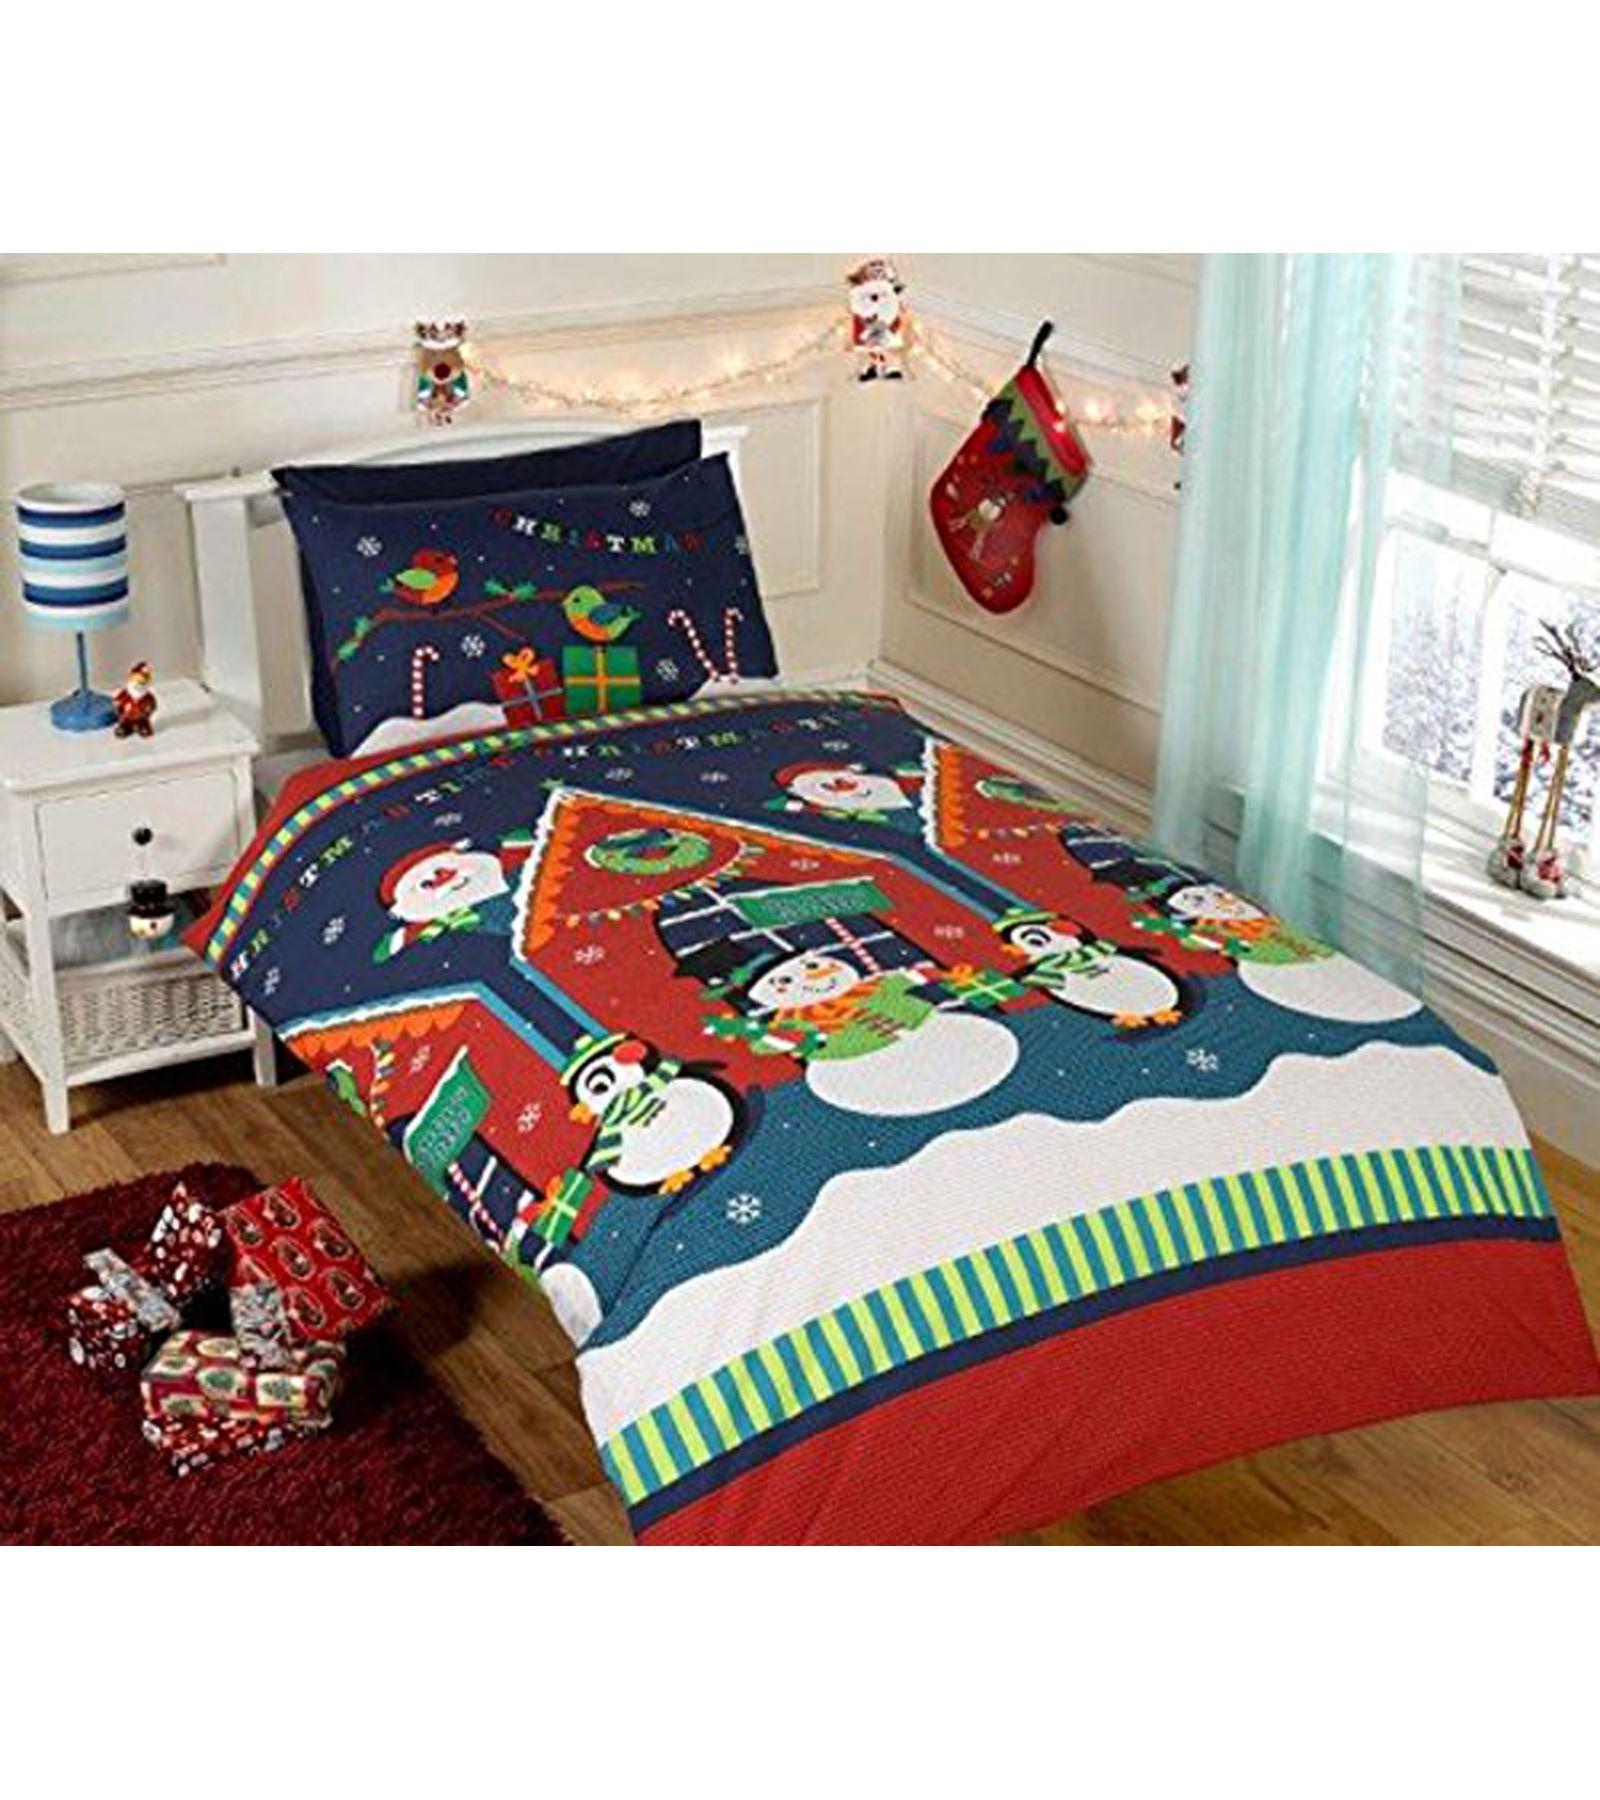 CHRISTMAS DUVET COVER BEDDING SETS SINGLE DOUBLE Amp